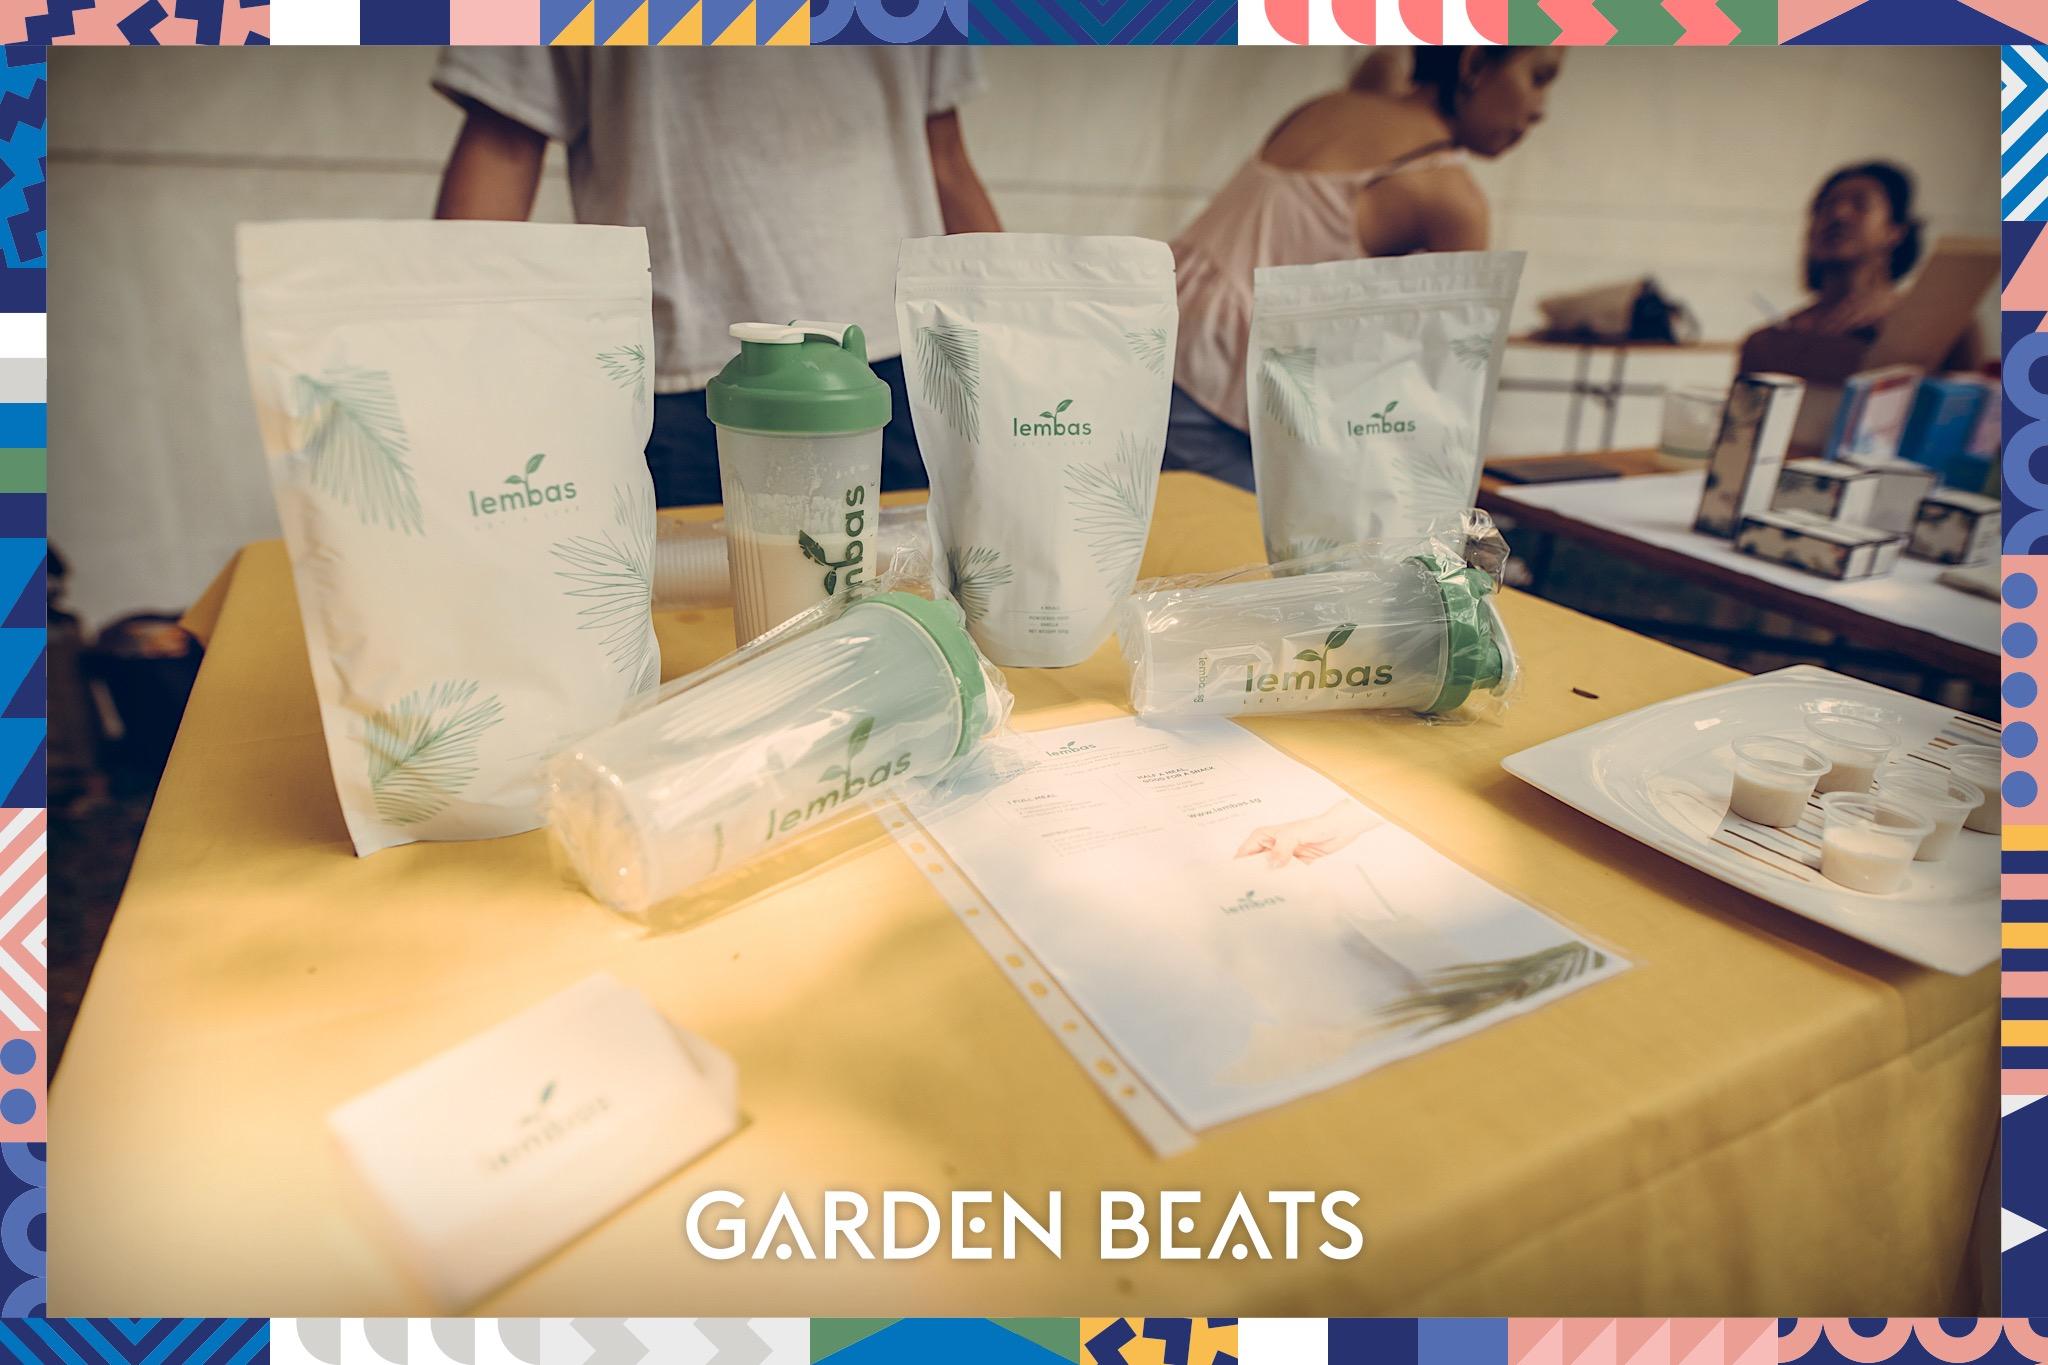 03032018_GardenBeats_Colossal133_Watermarked.jpg